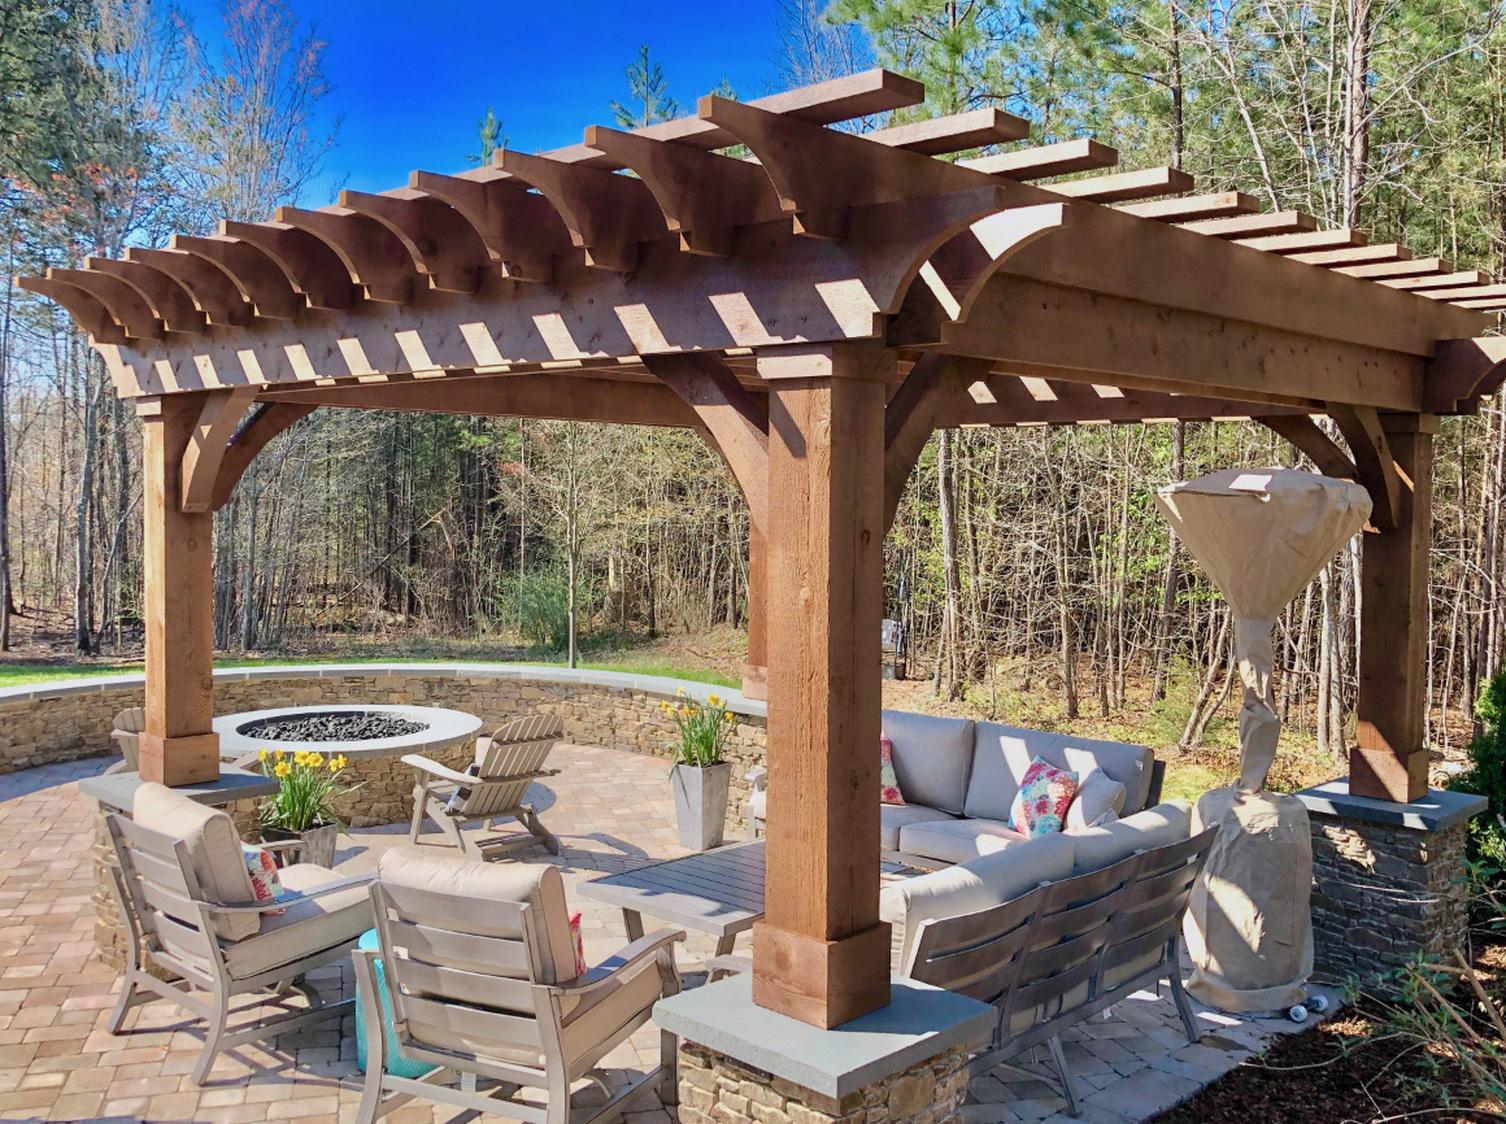 Outdoor Living pergola installation service